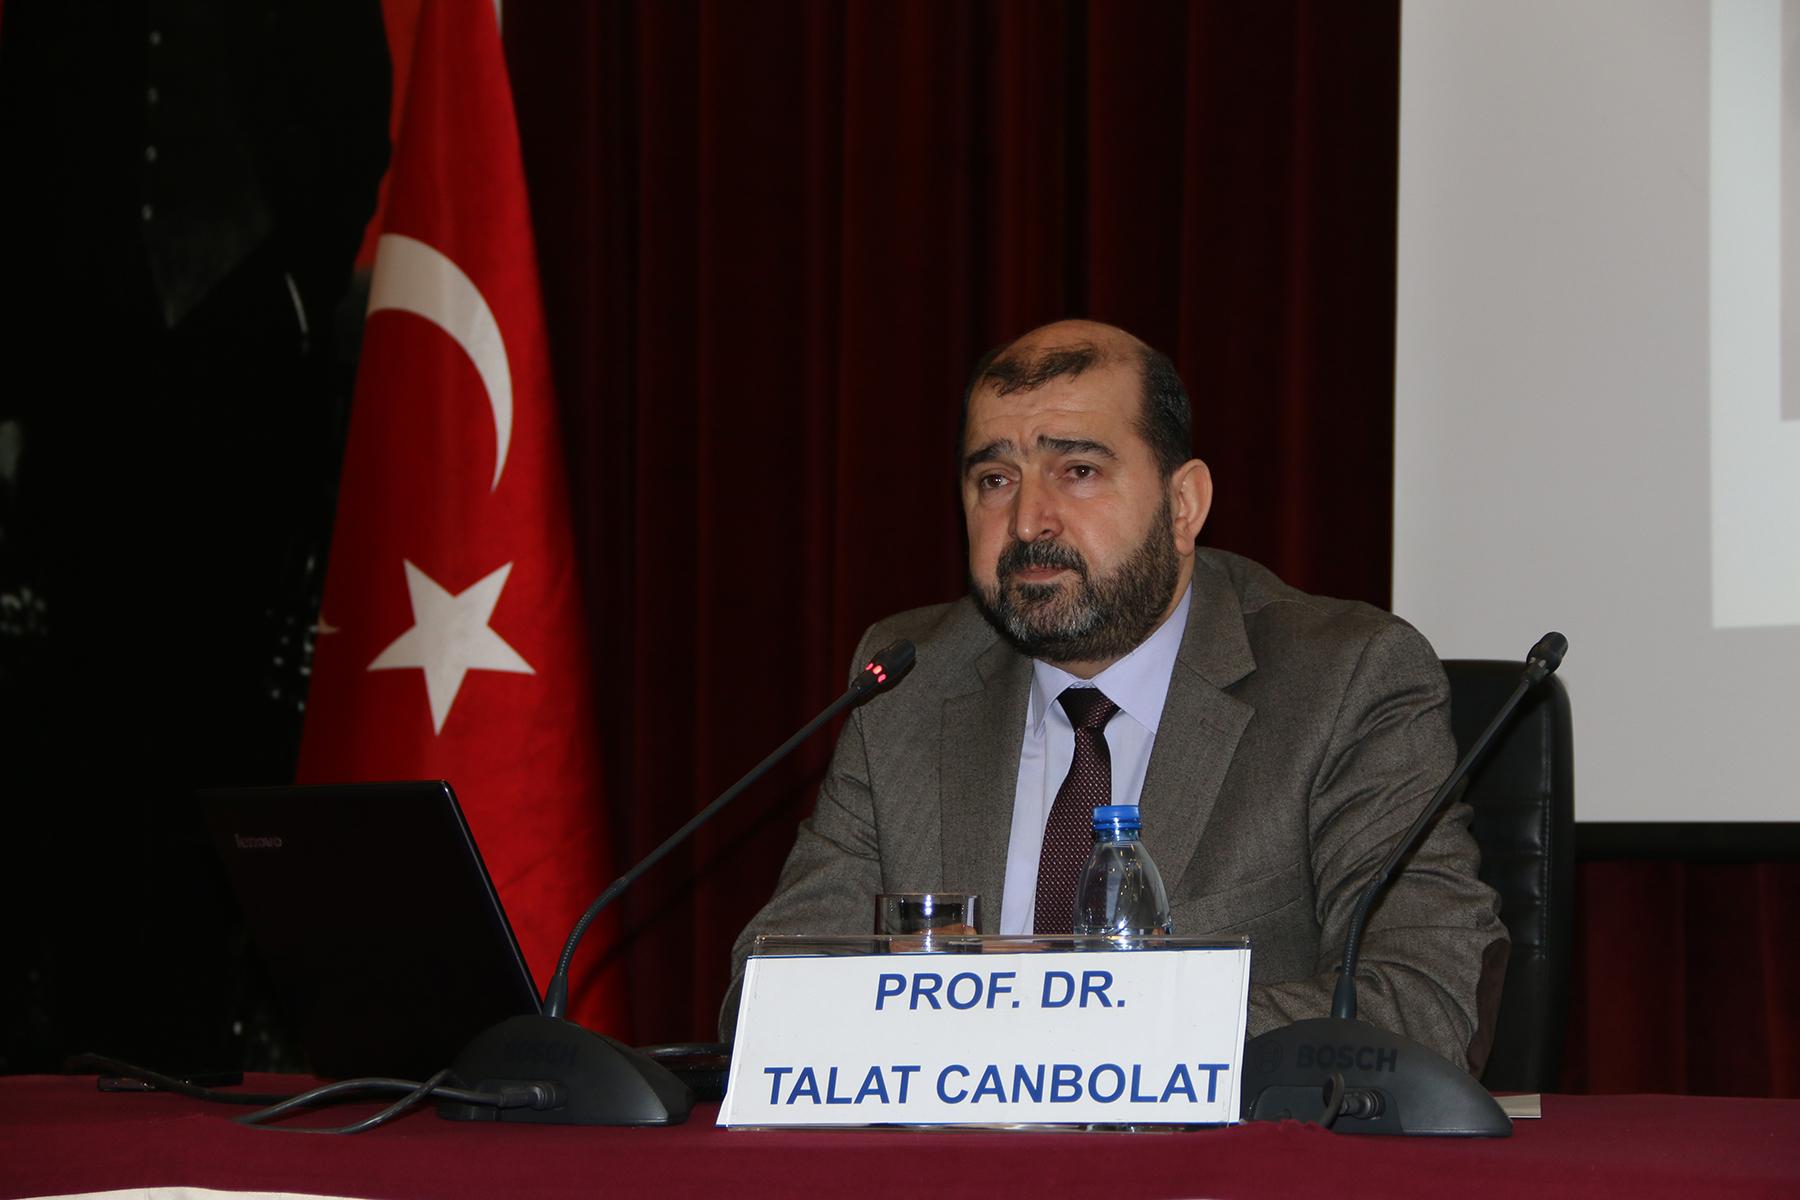 İstanbul Barosu Başkan Adayları - 2018 - Av. Talat CANBOLAT